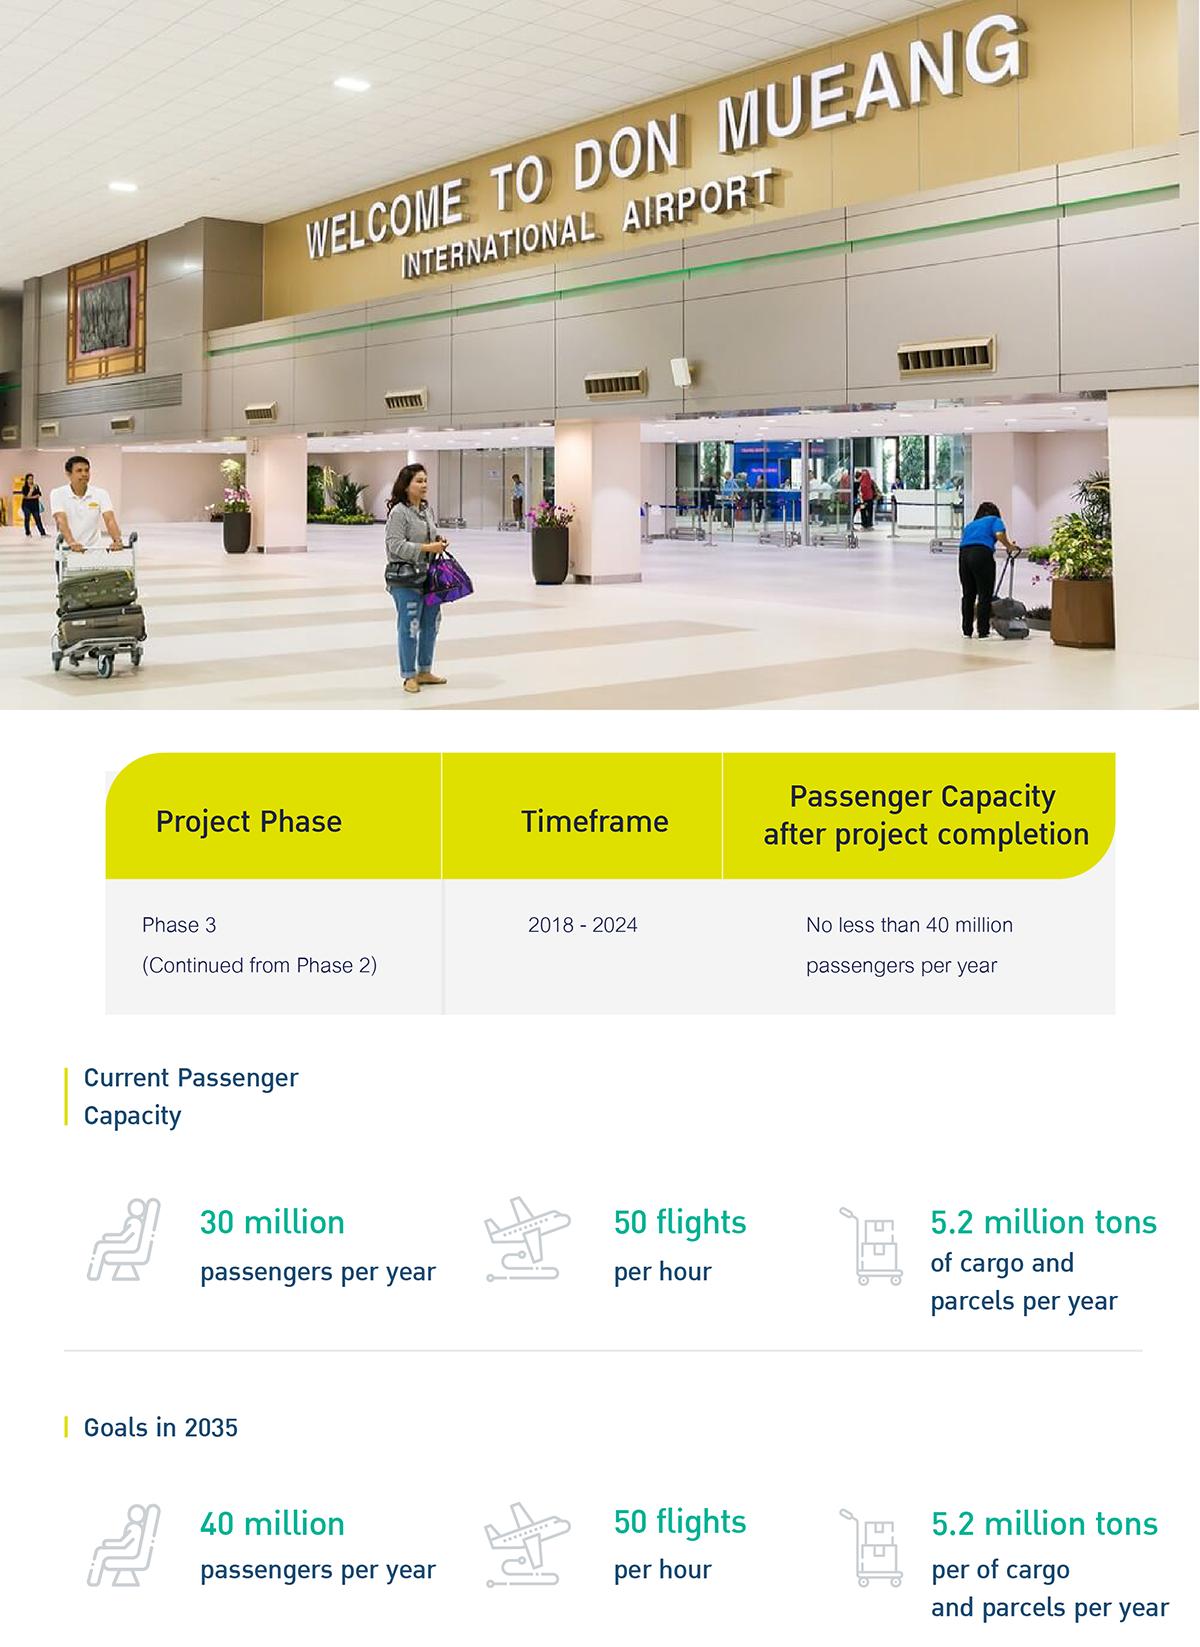 Don Mueang Airport Development Master Plan